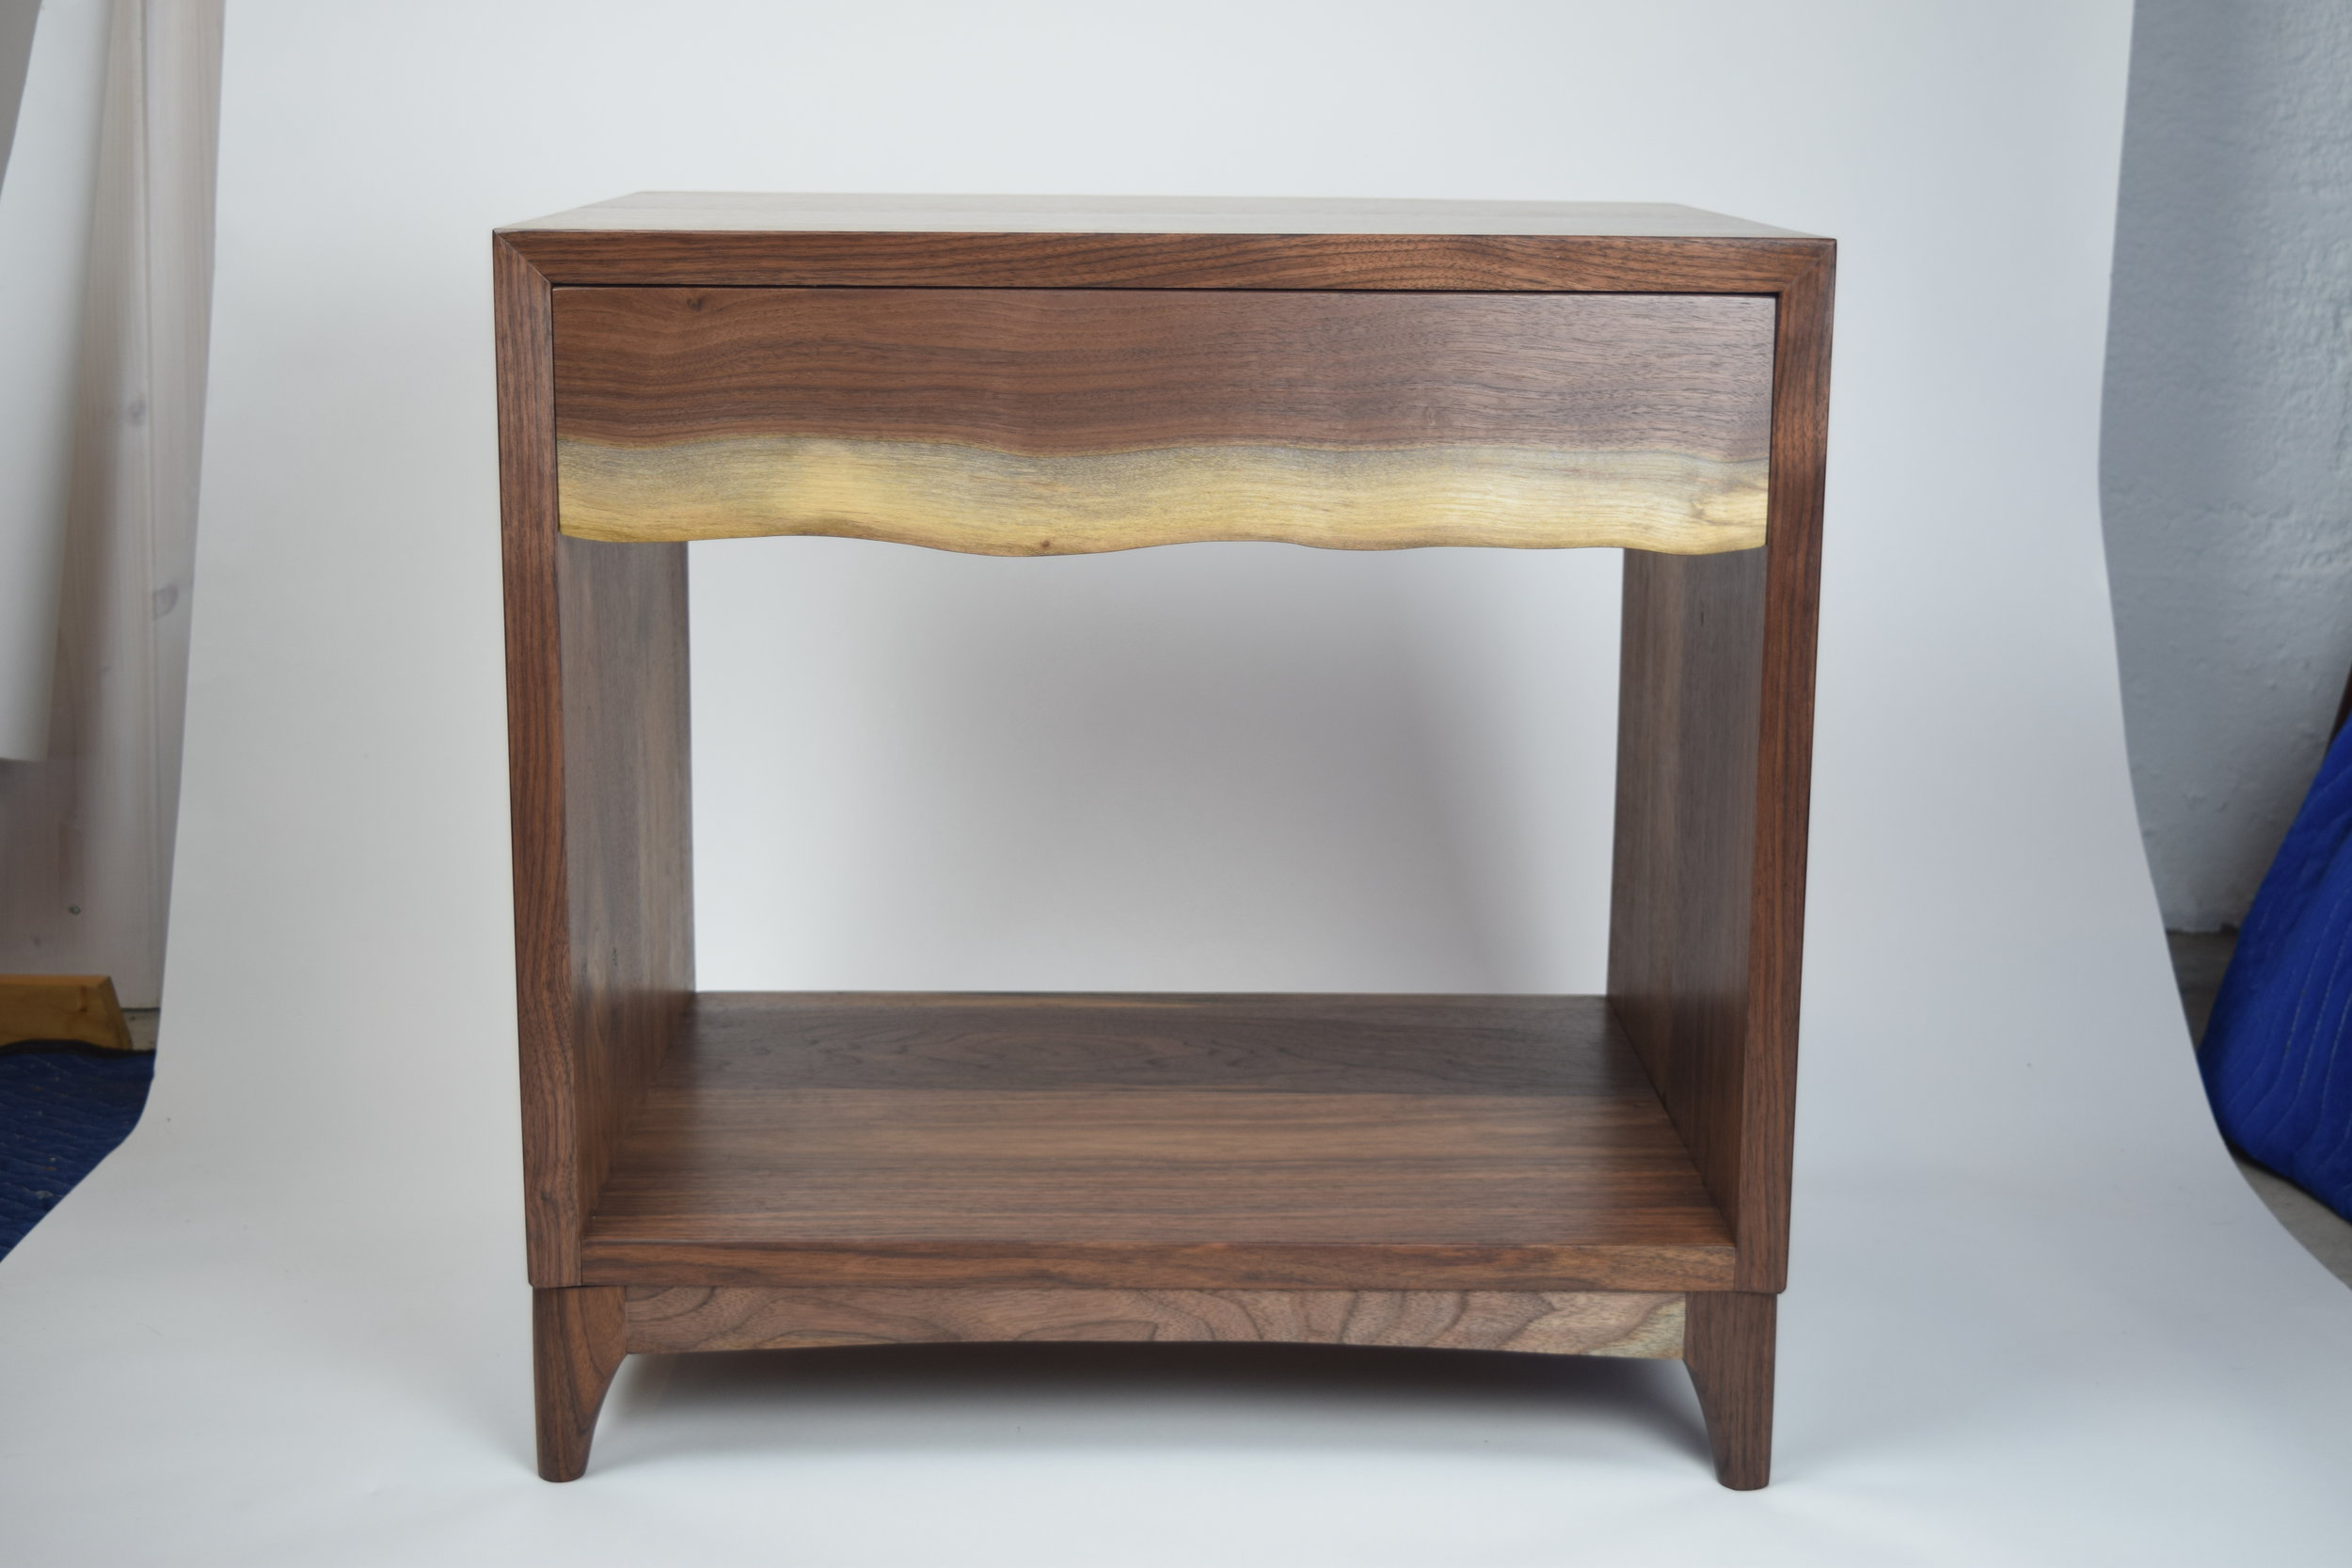 Mid-Century ModernNightstand - Oregon Black Walnut, Live-edge drawer